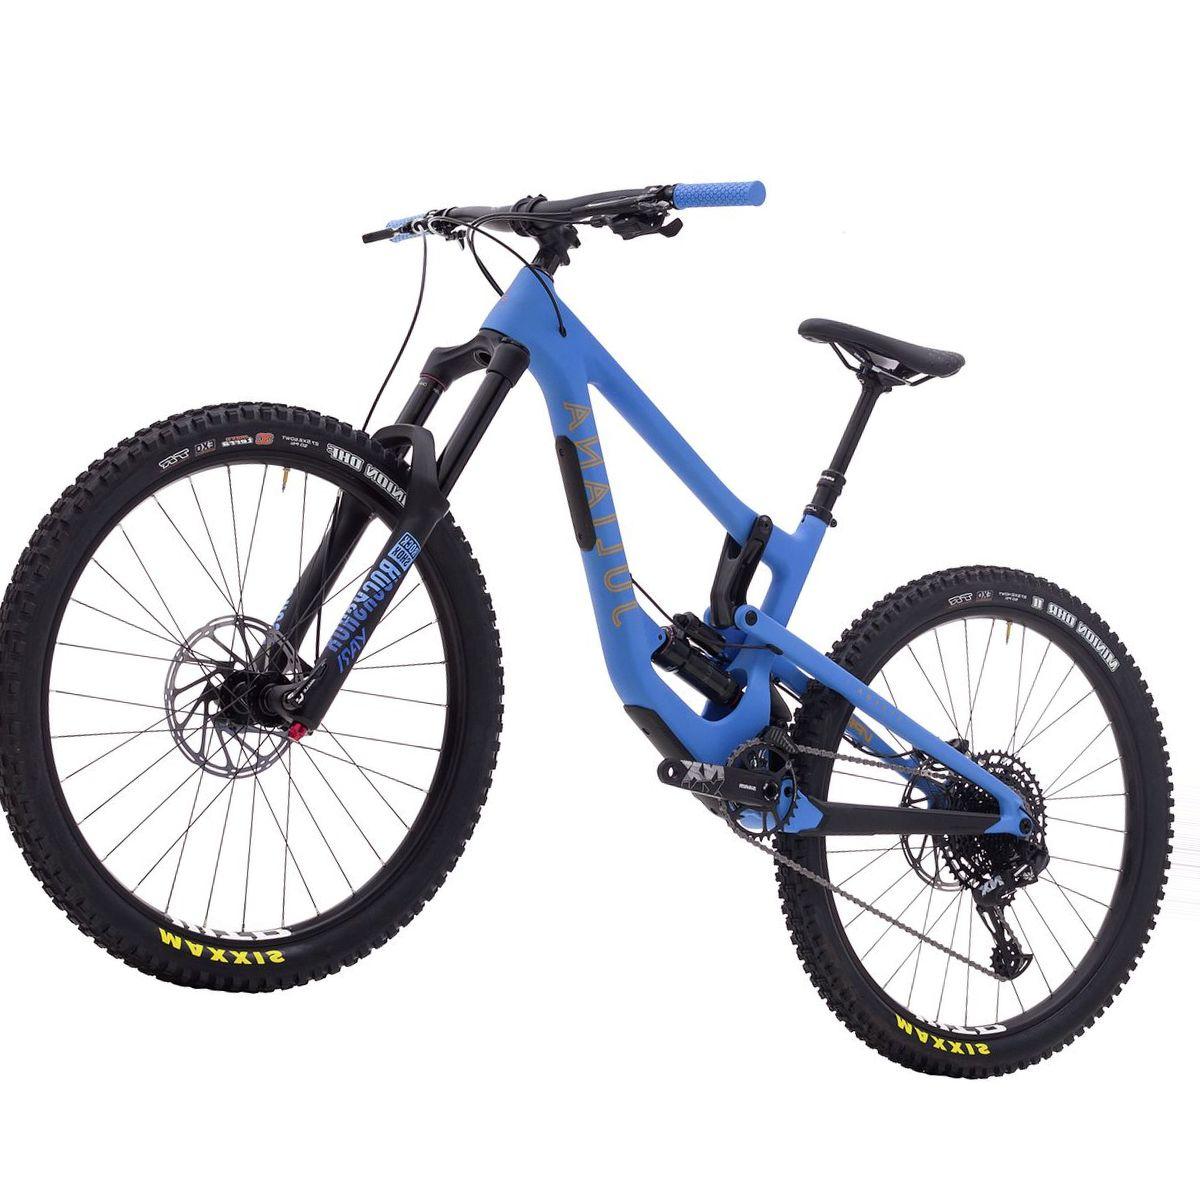 Juliana Strega Carbon R Mountain Bike - Women's